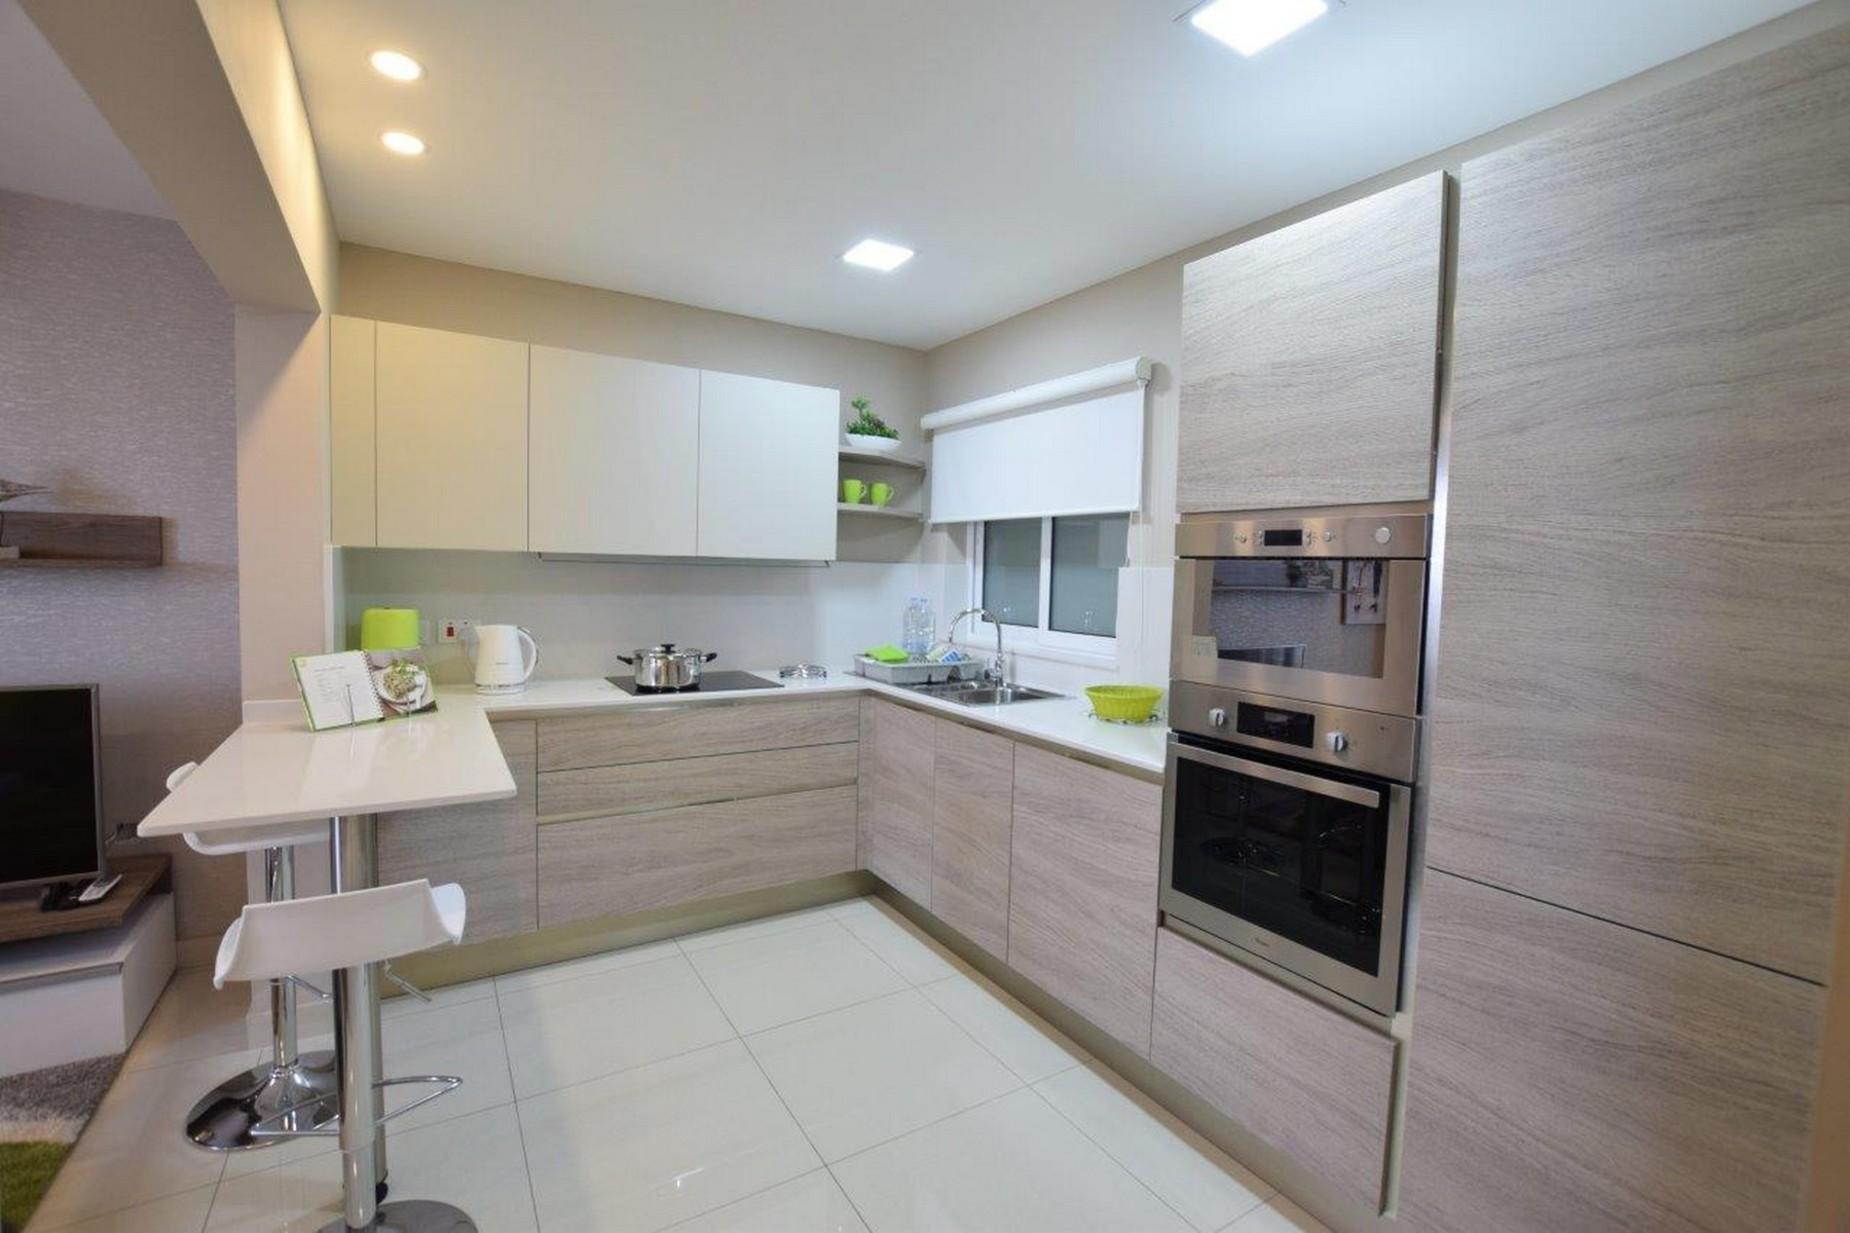 3 bed Apartment For Rent in Sliema, Sliema - thumb 9